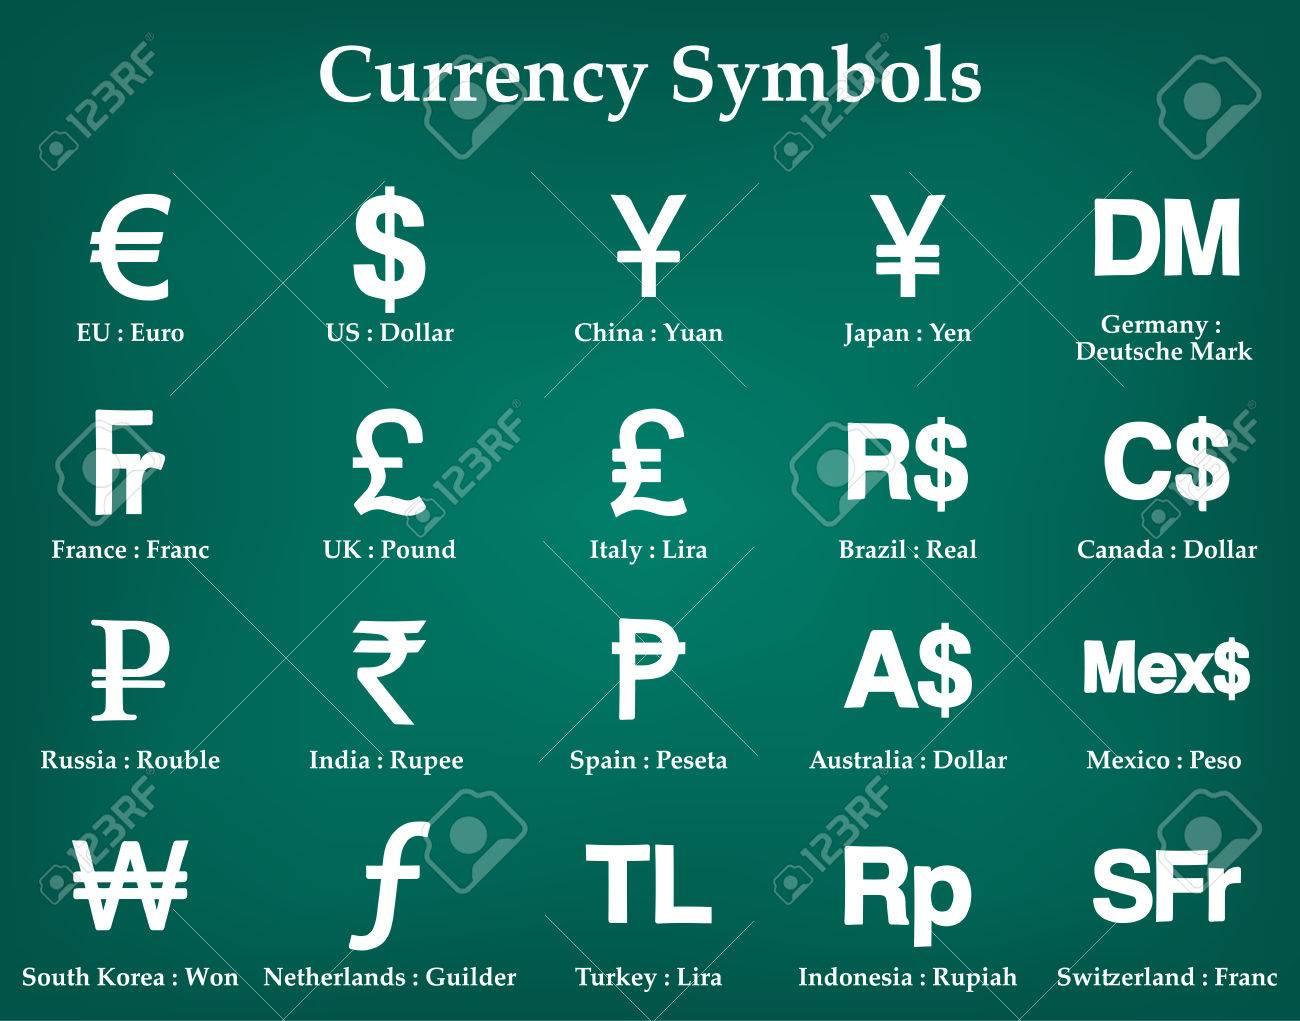 Currency symbols royalty free cliparts vectors and stock currency symbols stock vector 38253422 biocorpaavc Choice Image